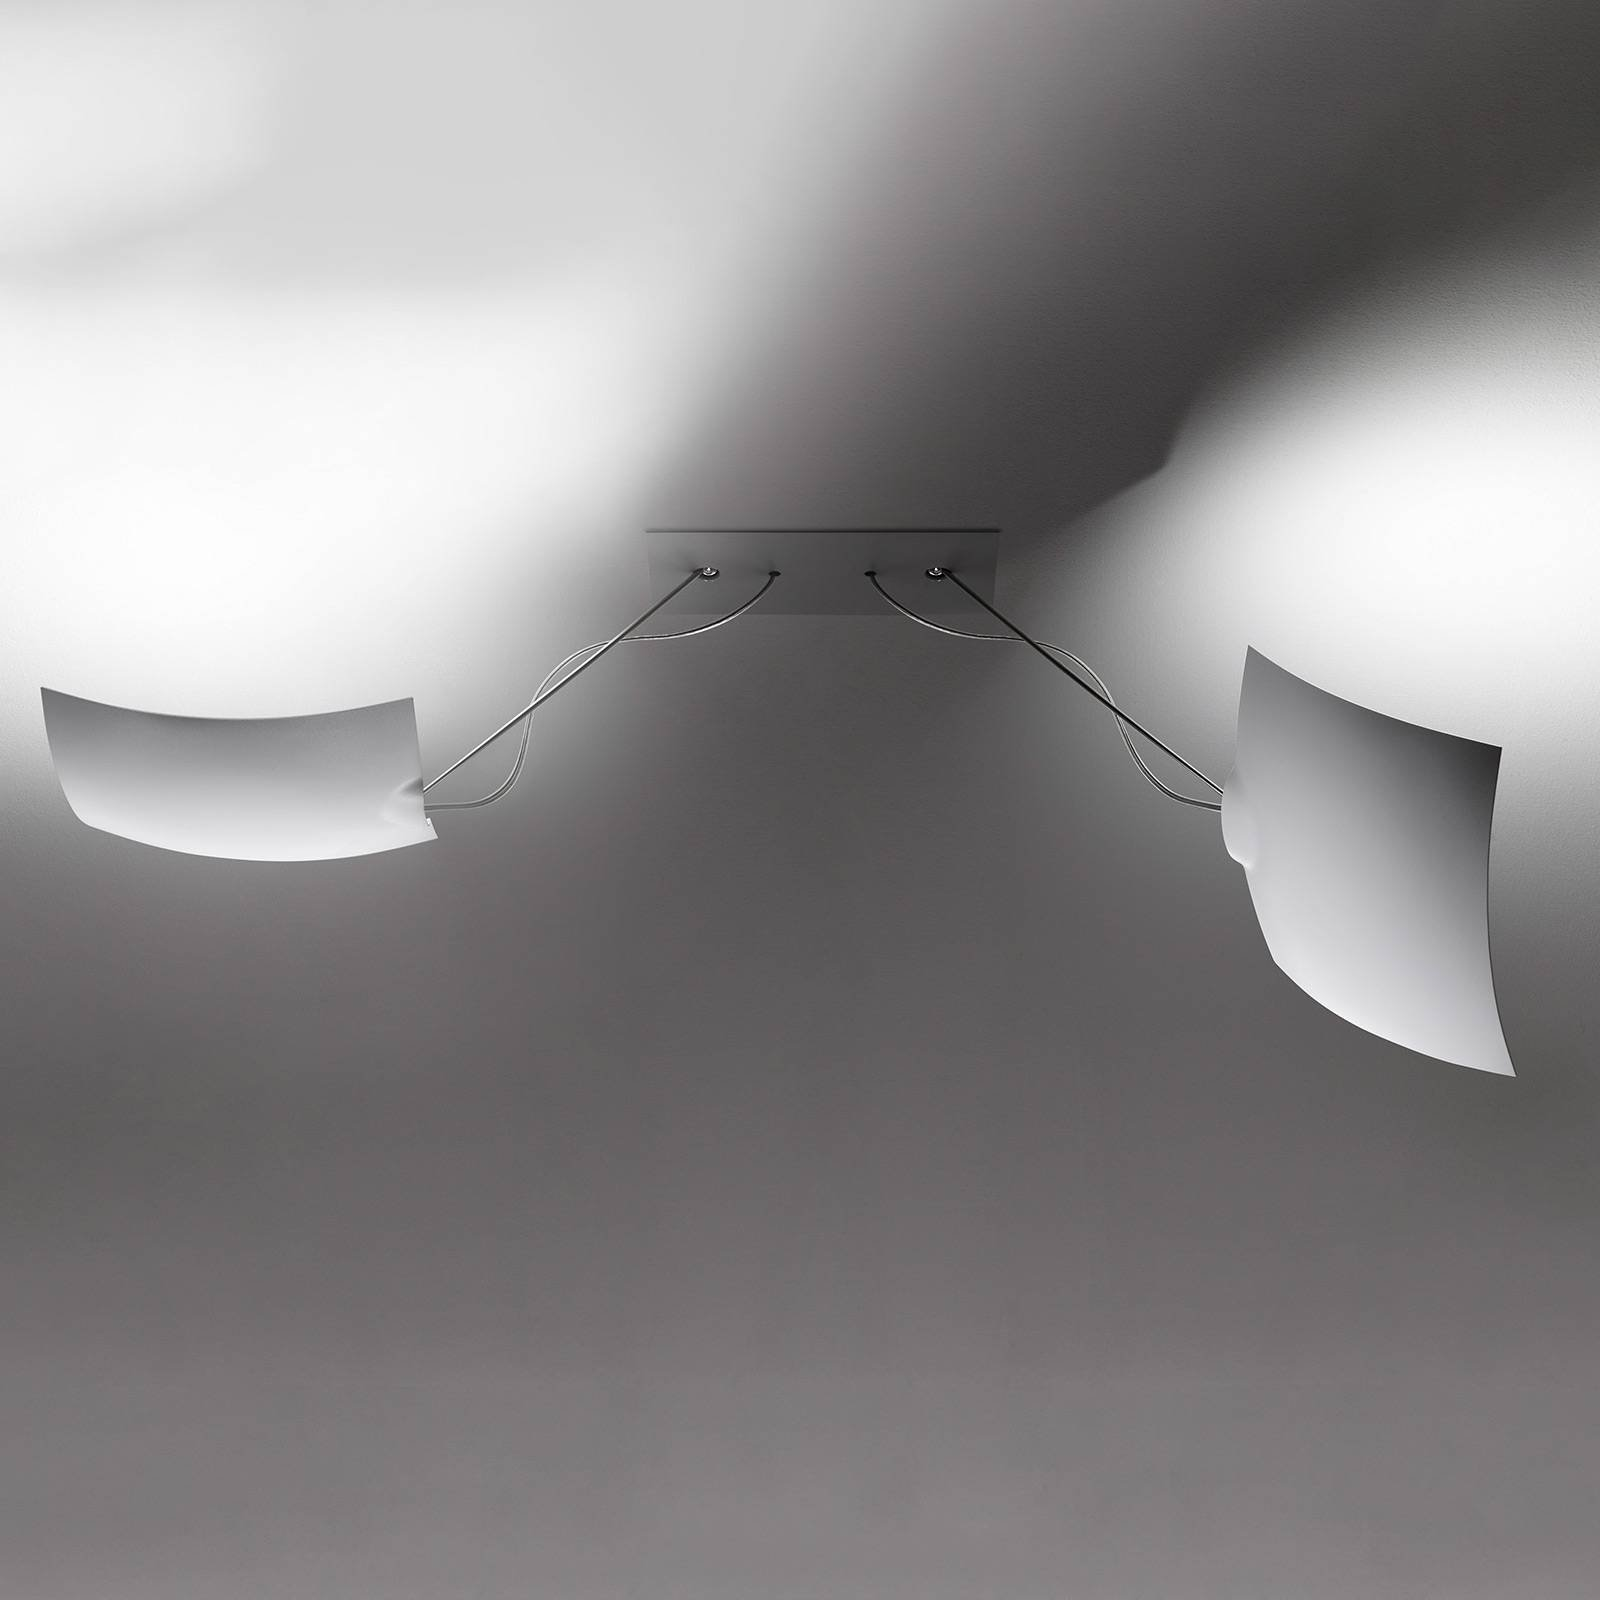 Ingo Maurer 2x18x18 LED-taklampe, 2 lyskilder